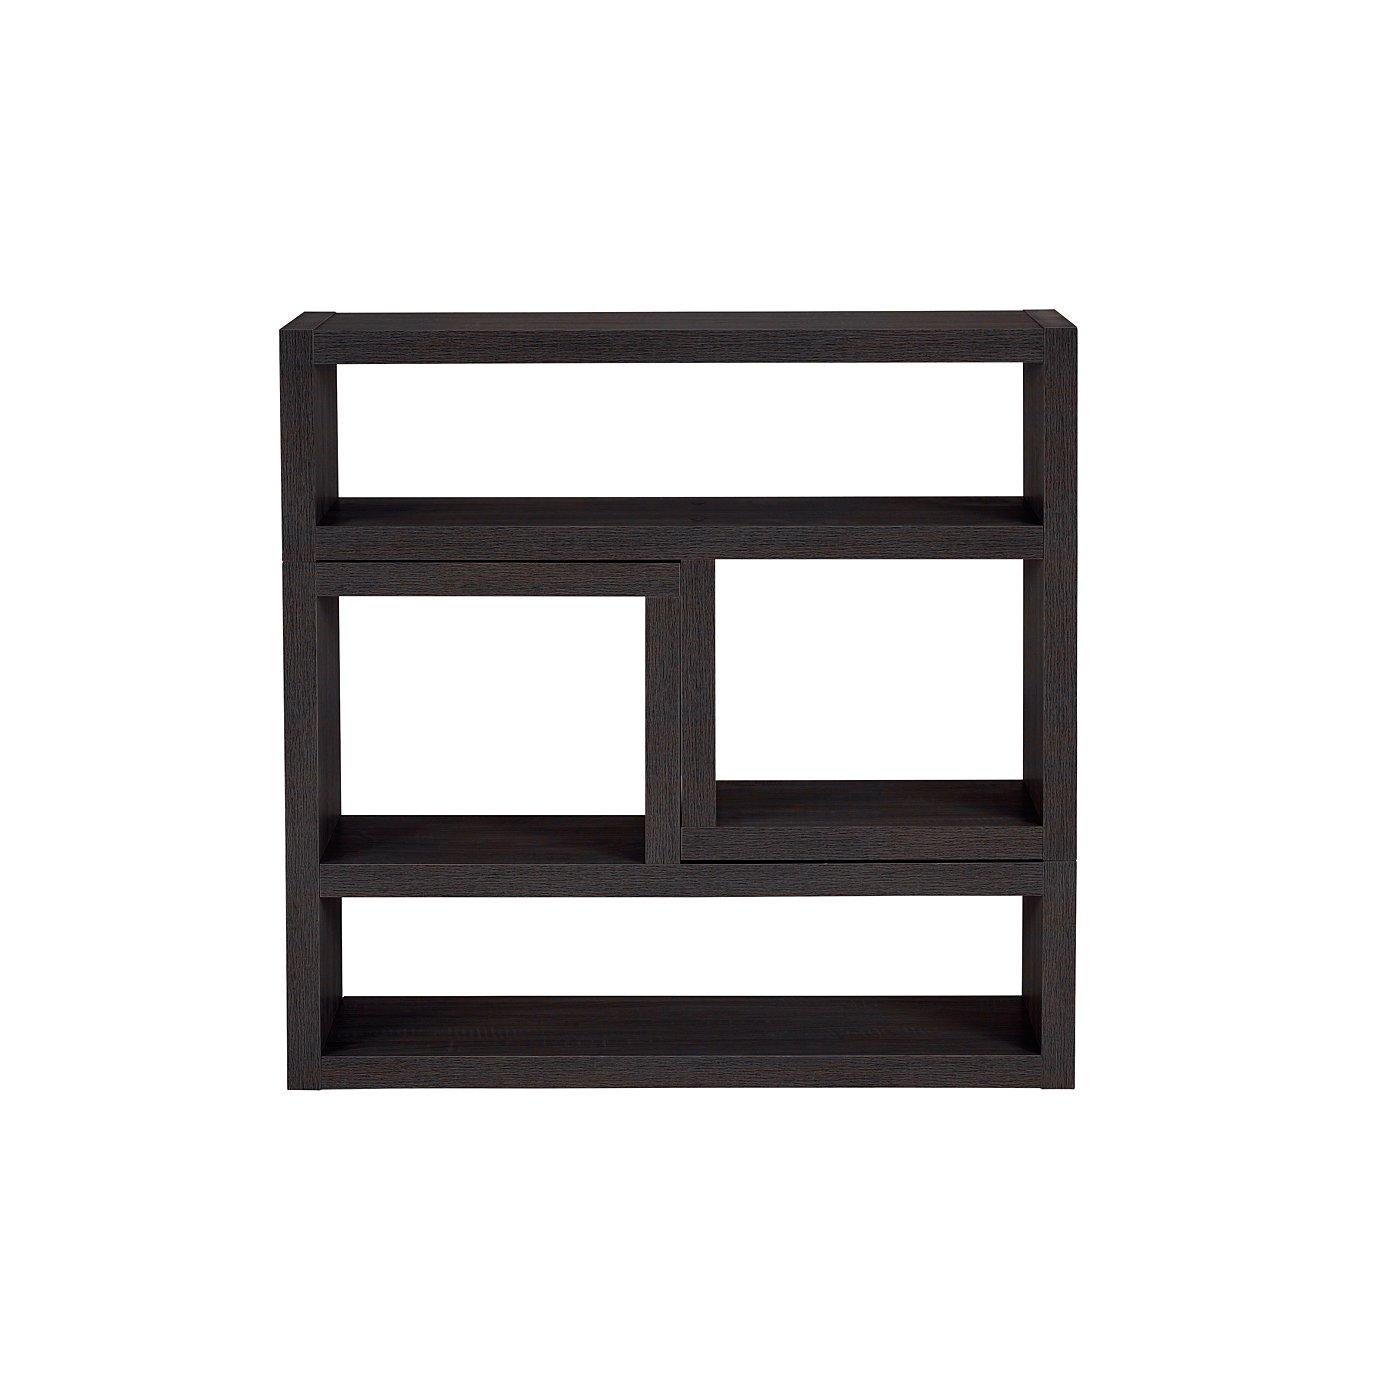 Leighton Living Room Furniture Range - Dark Oak Effect | View All ...